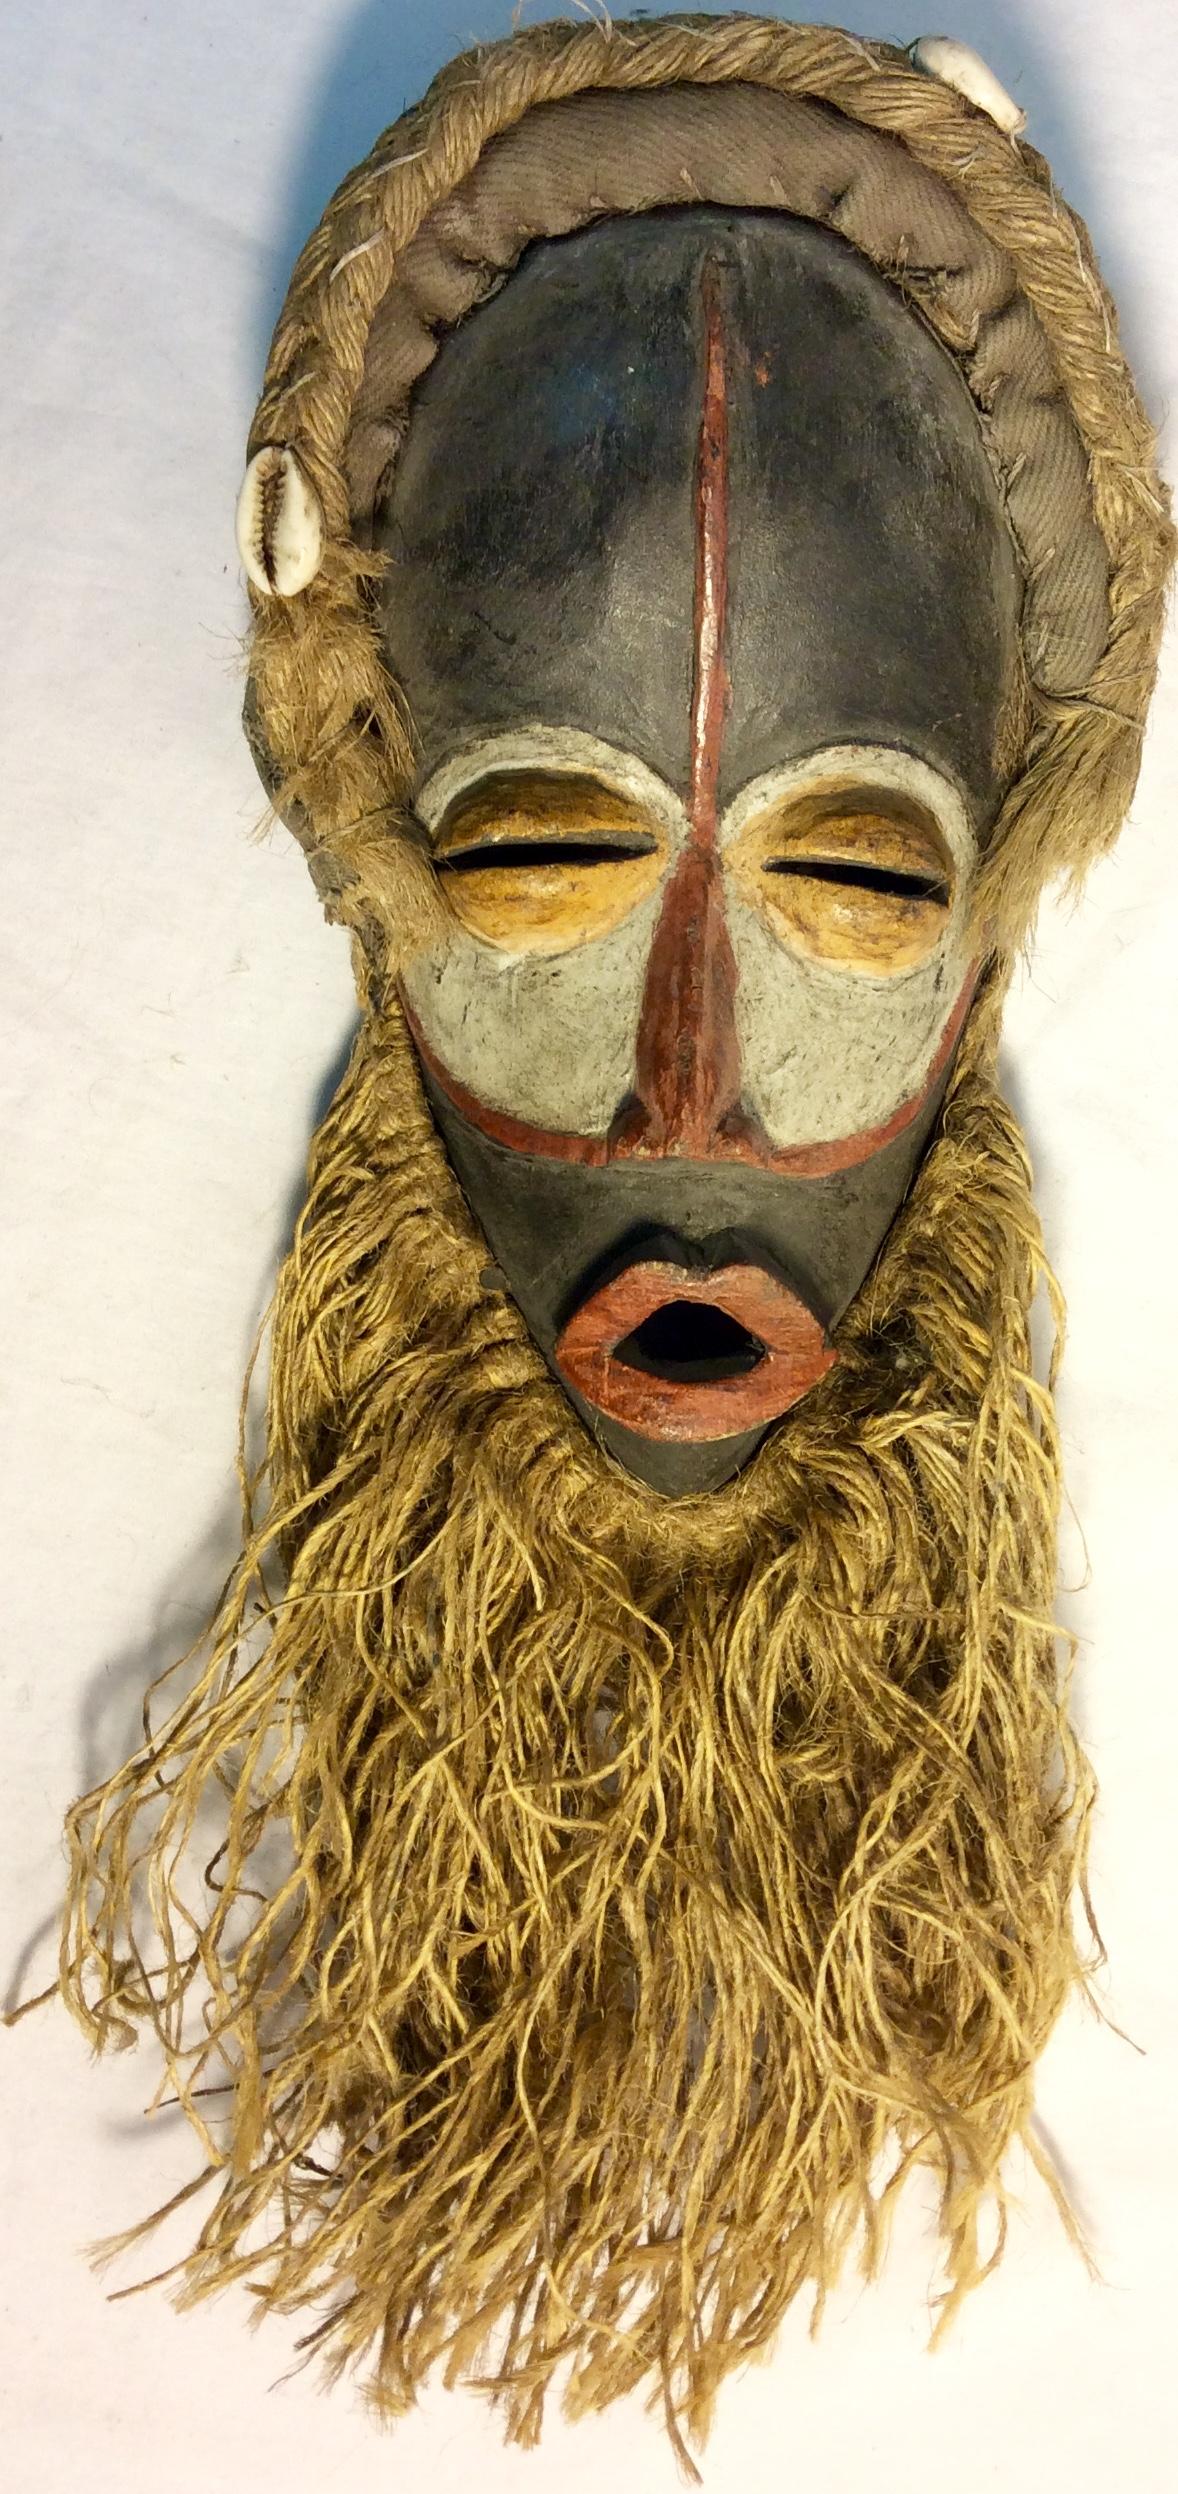 Tradicional african mask. Wood and raffia